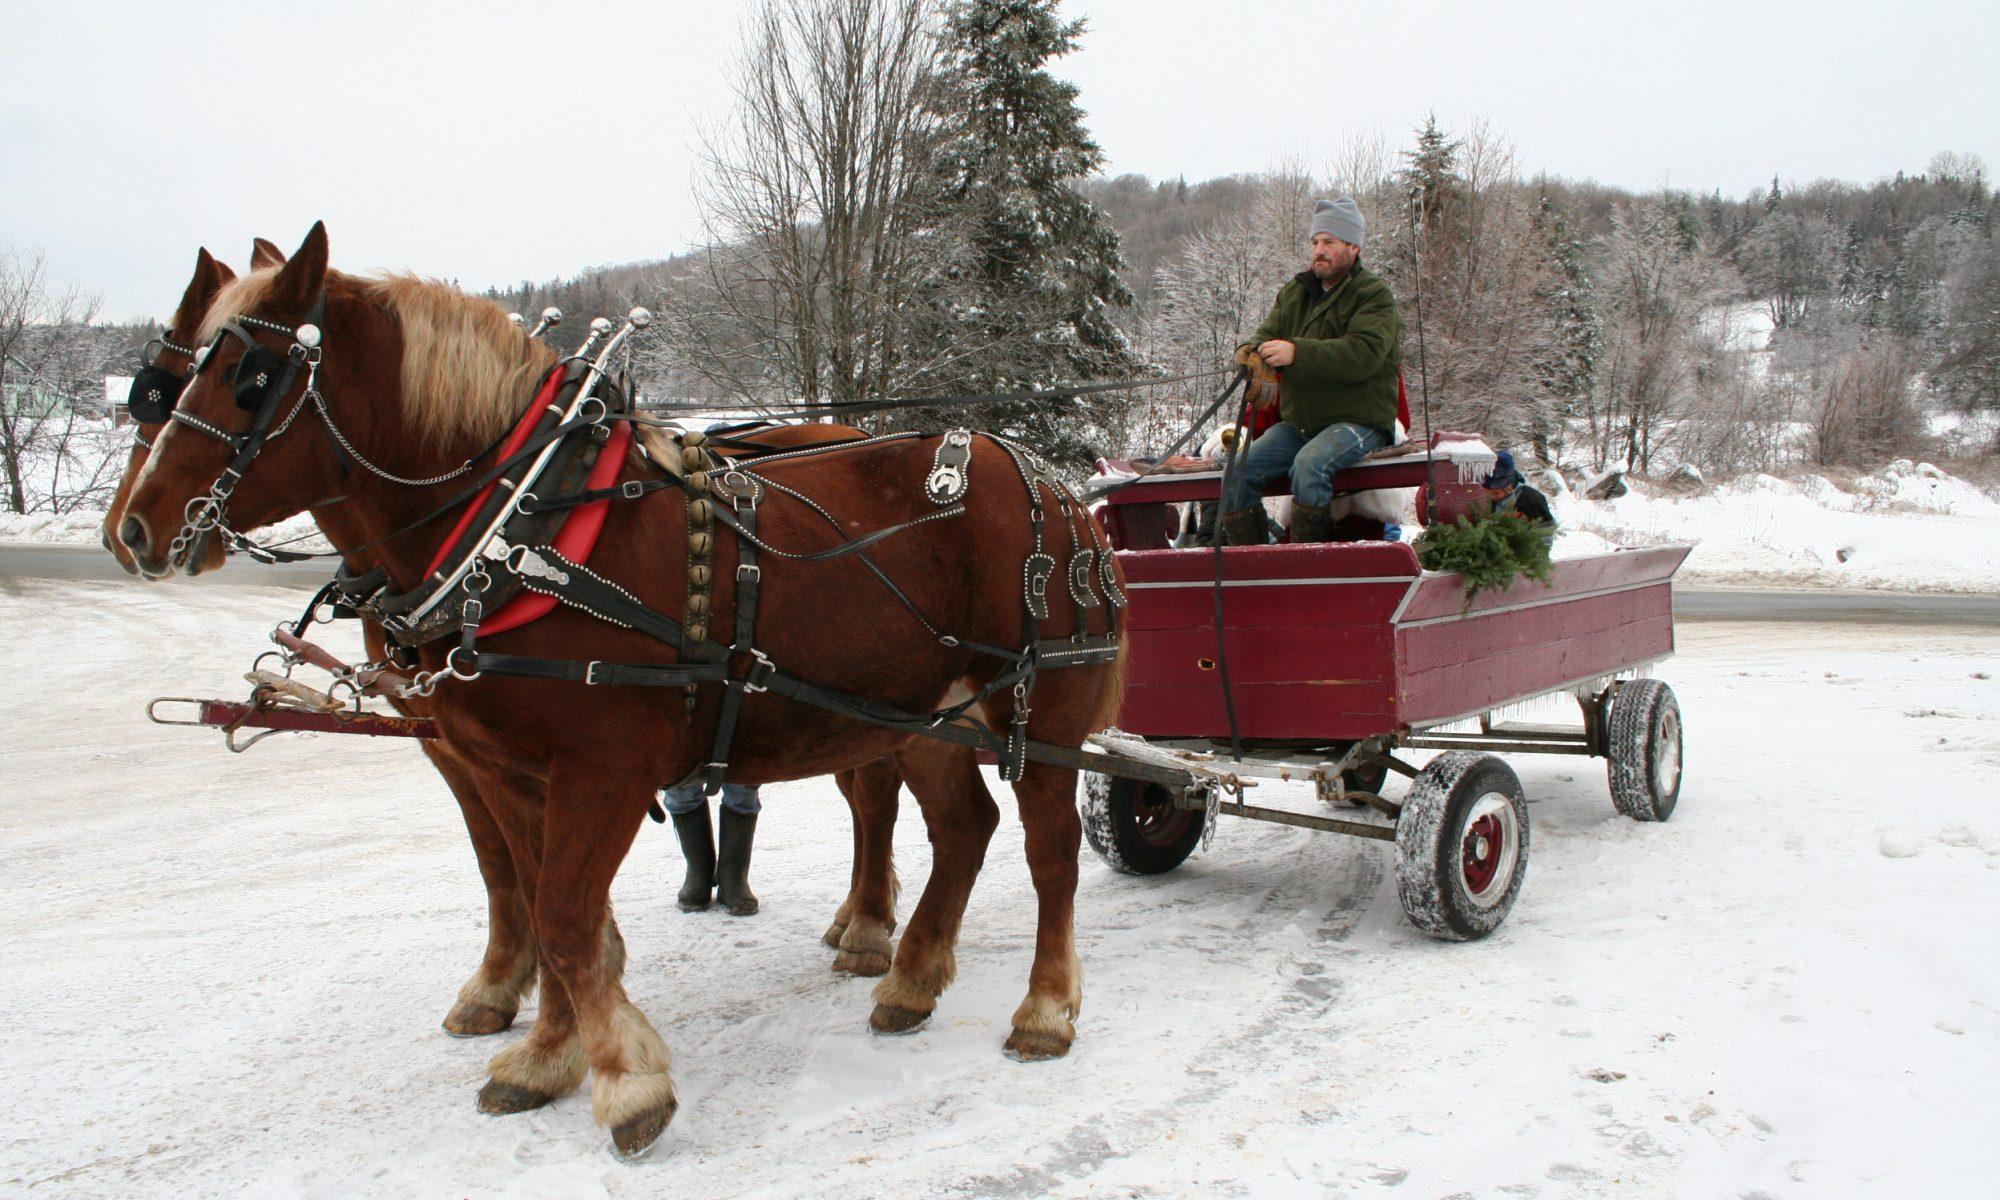 VT Wagon Rides